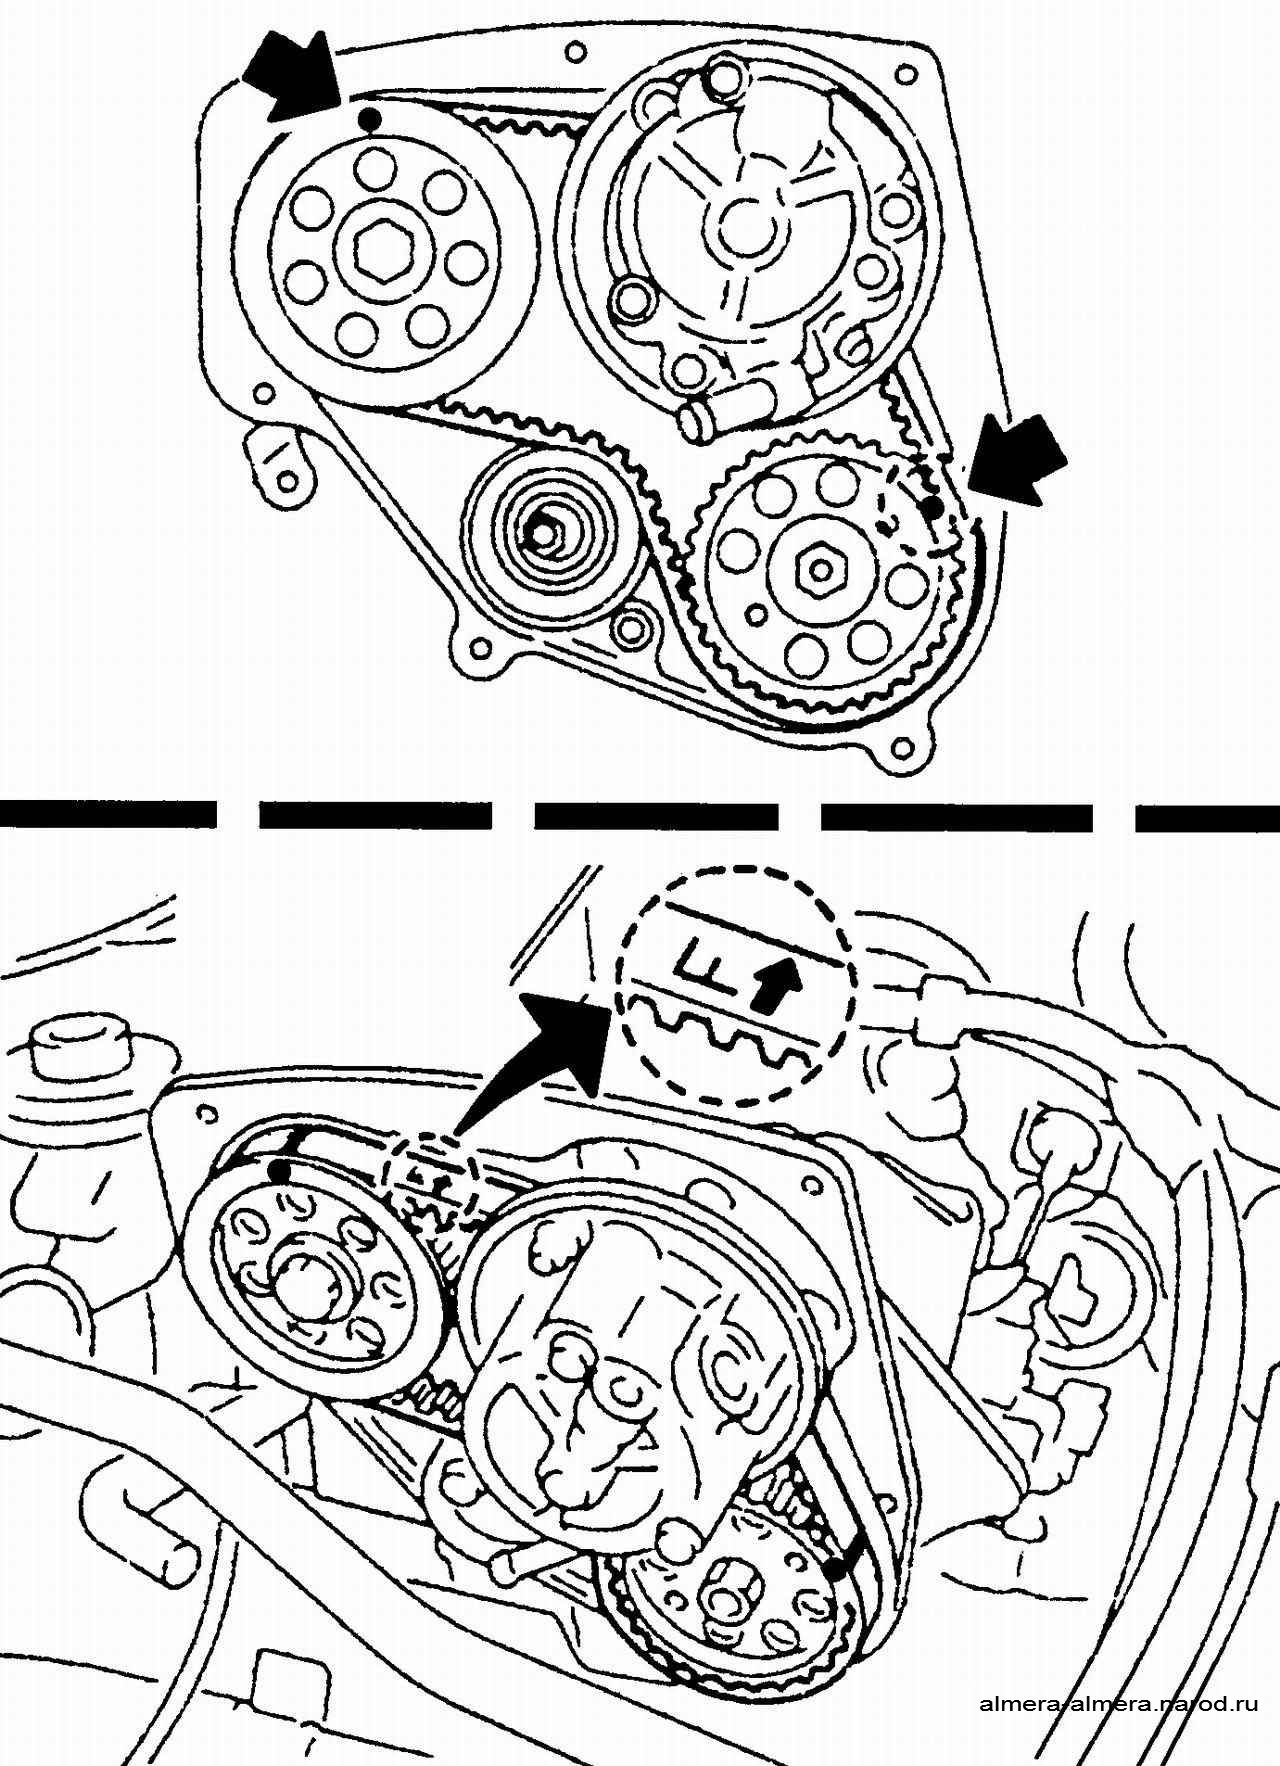 ниссан ларго двигатель cd20 схема